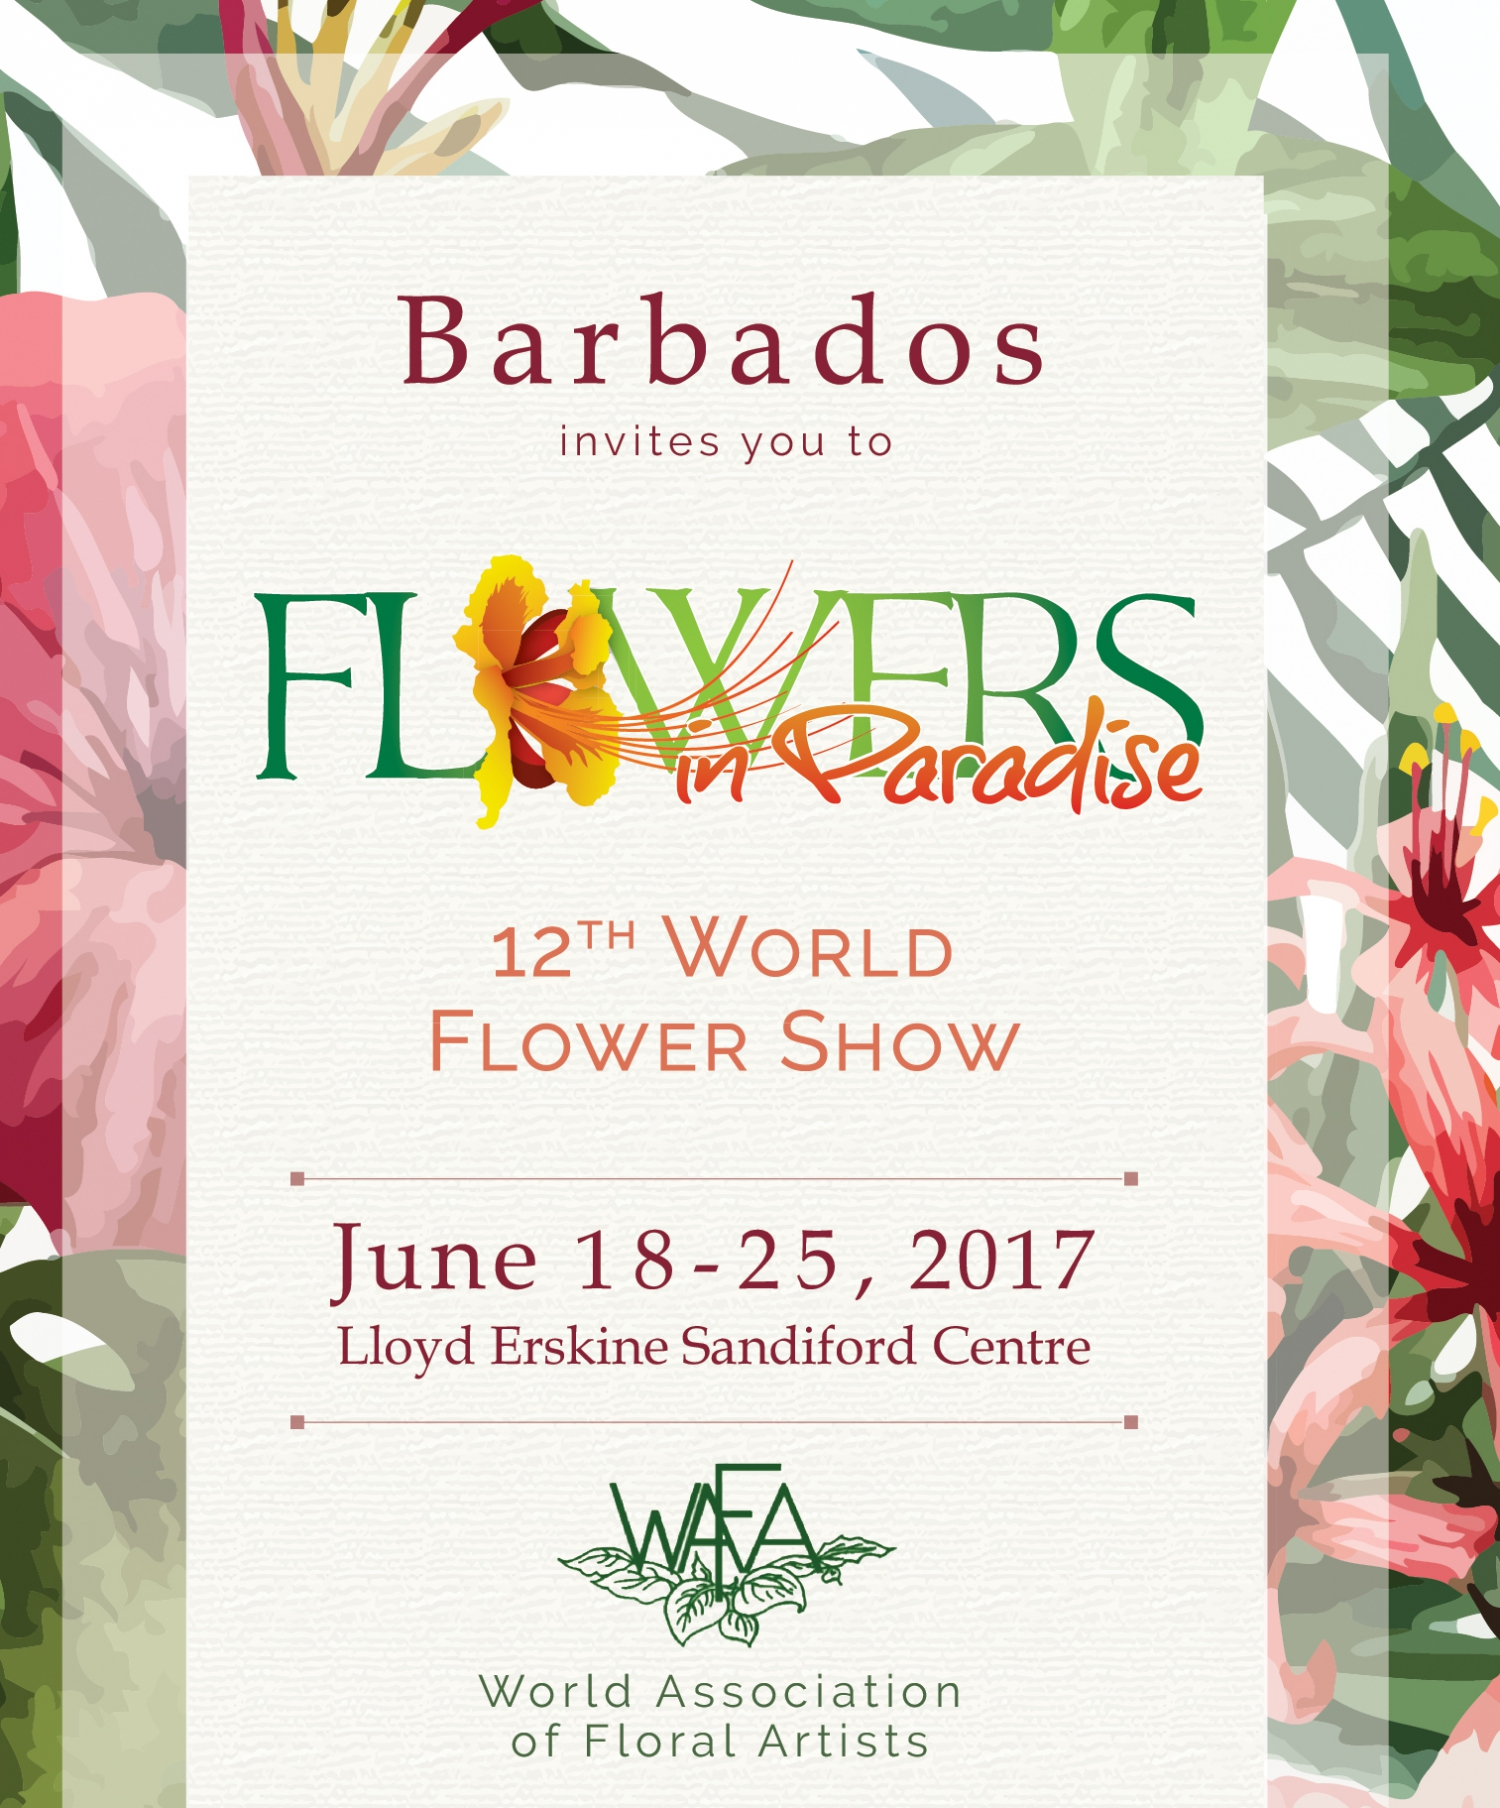 'Flowers in Paradise' - WAFA World Flower Show Barbados 2017